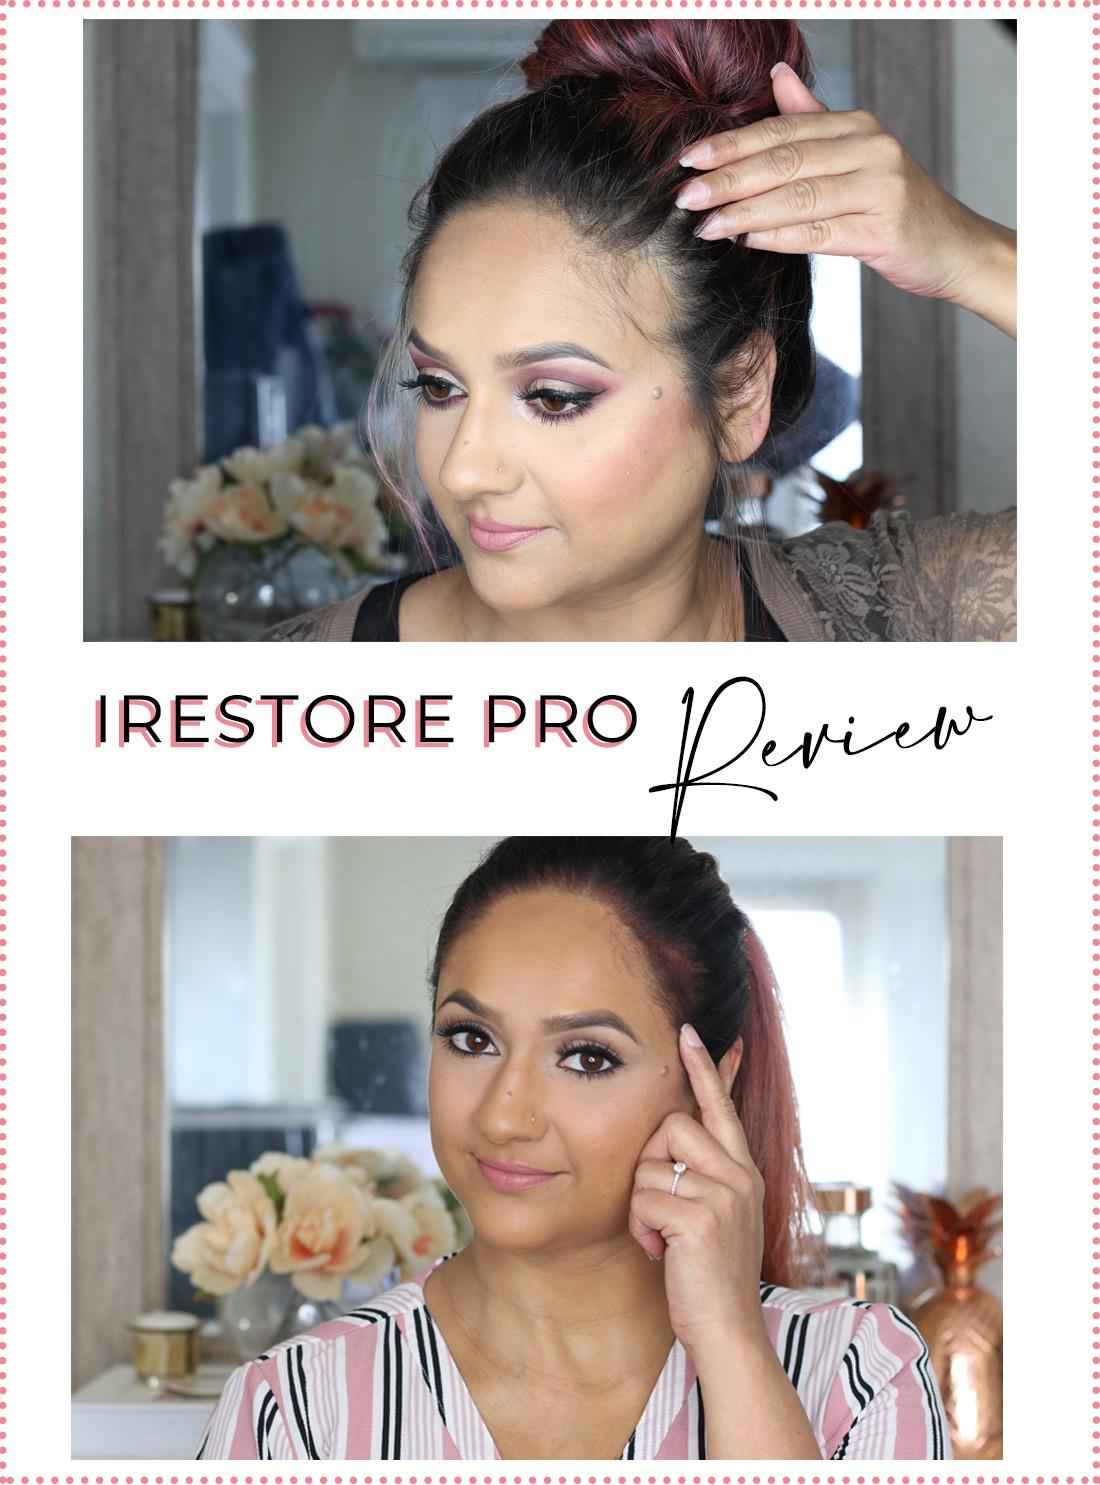 iRestore Pro Review Deepa Berar